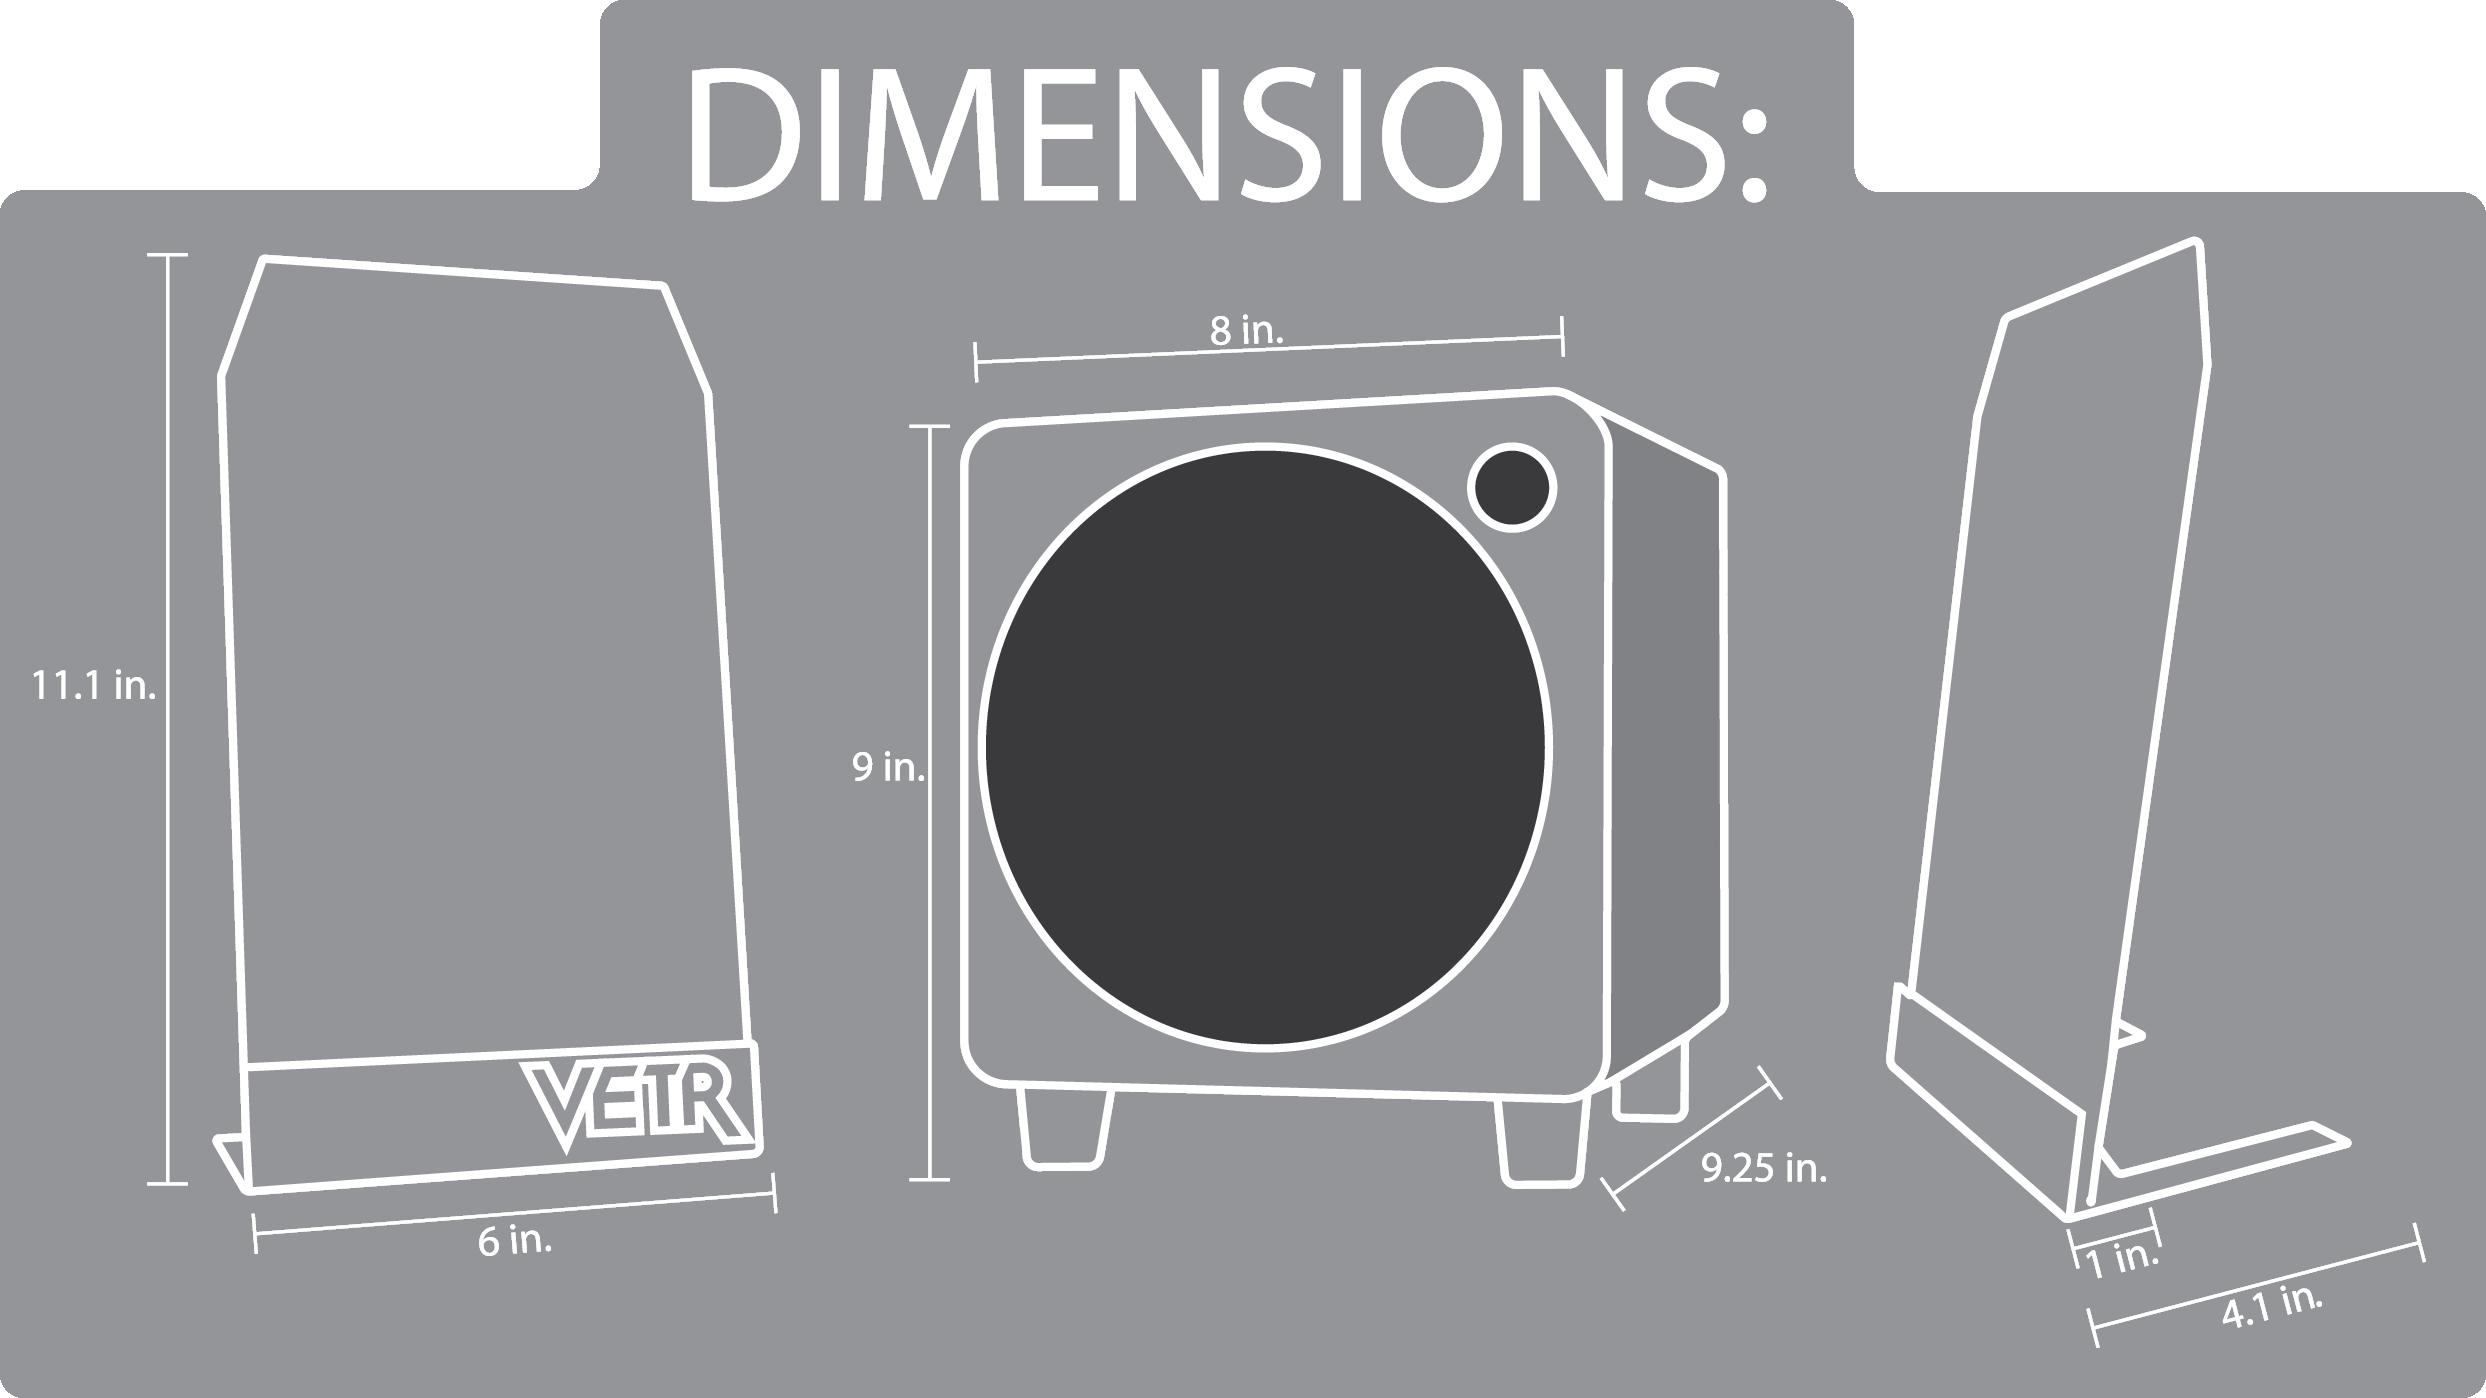 dimensions-01.png